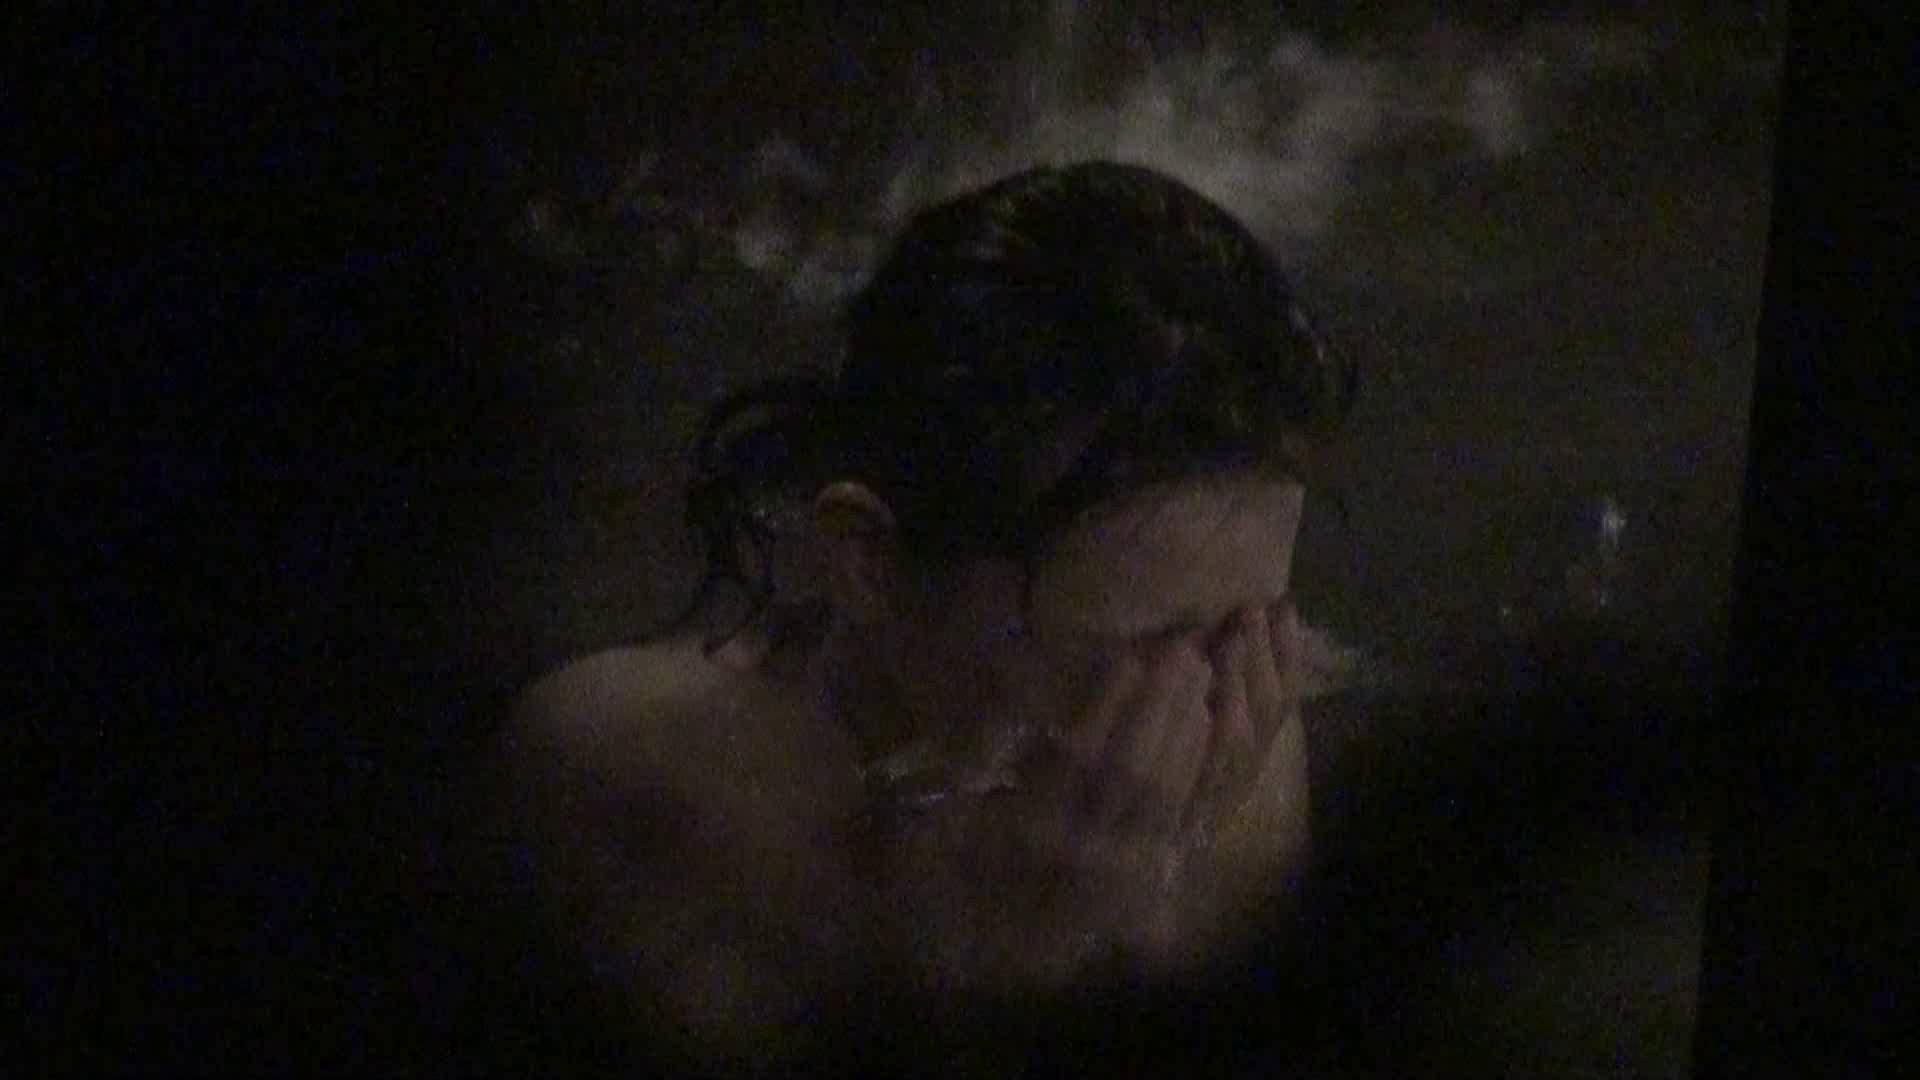 Aquaな露天風呂Vol.402 OLセックス  88画像 6